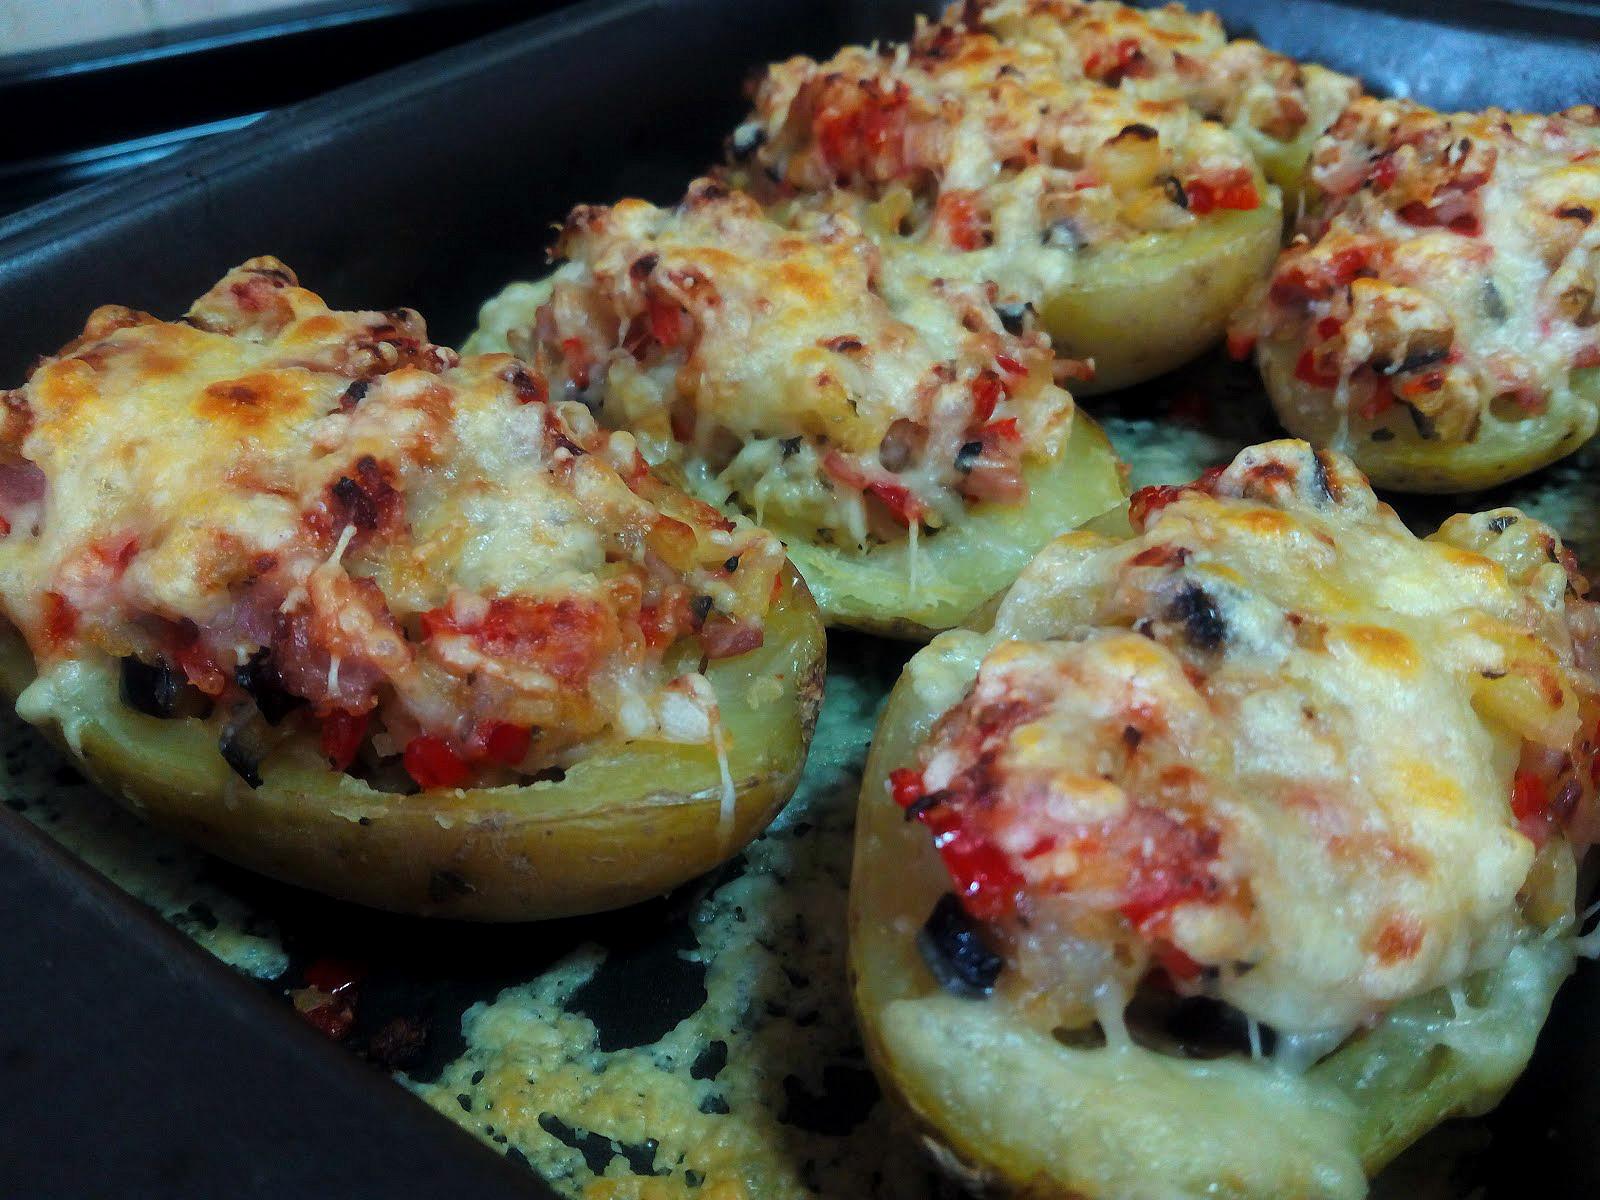 Recetas f ciles con patatas anna recetas f ciles - Rectas de cocina faciles ...